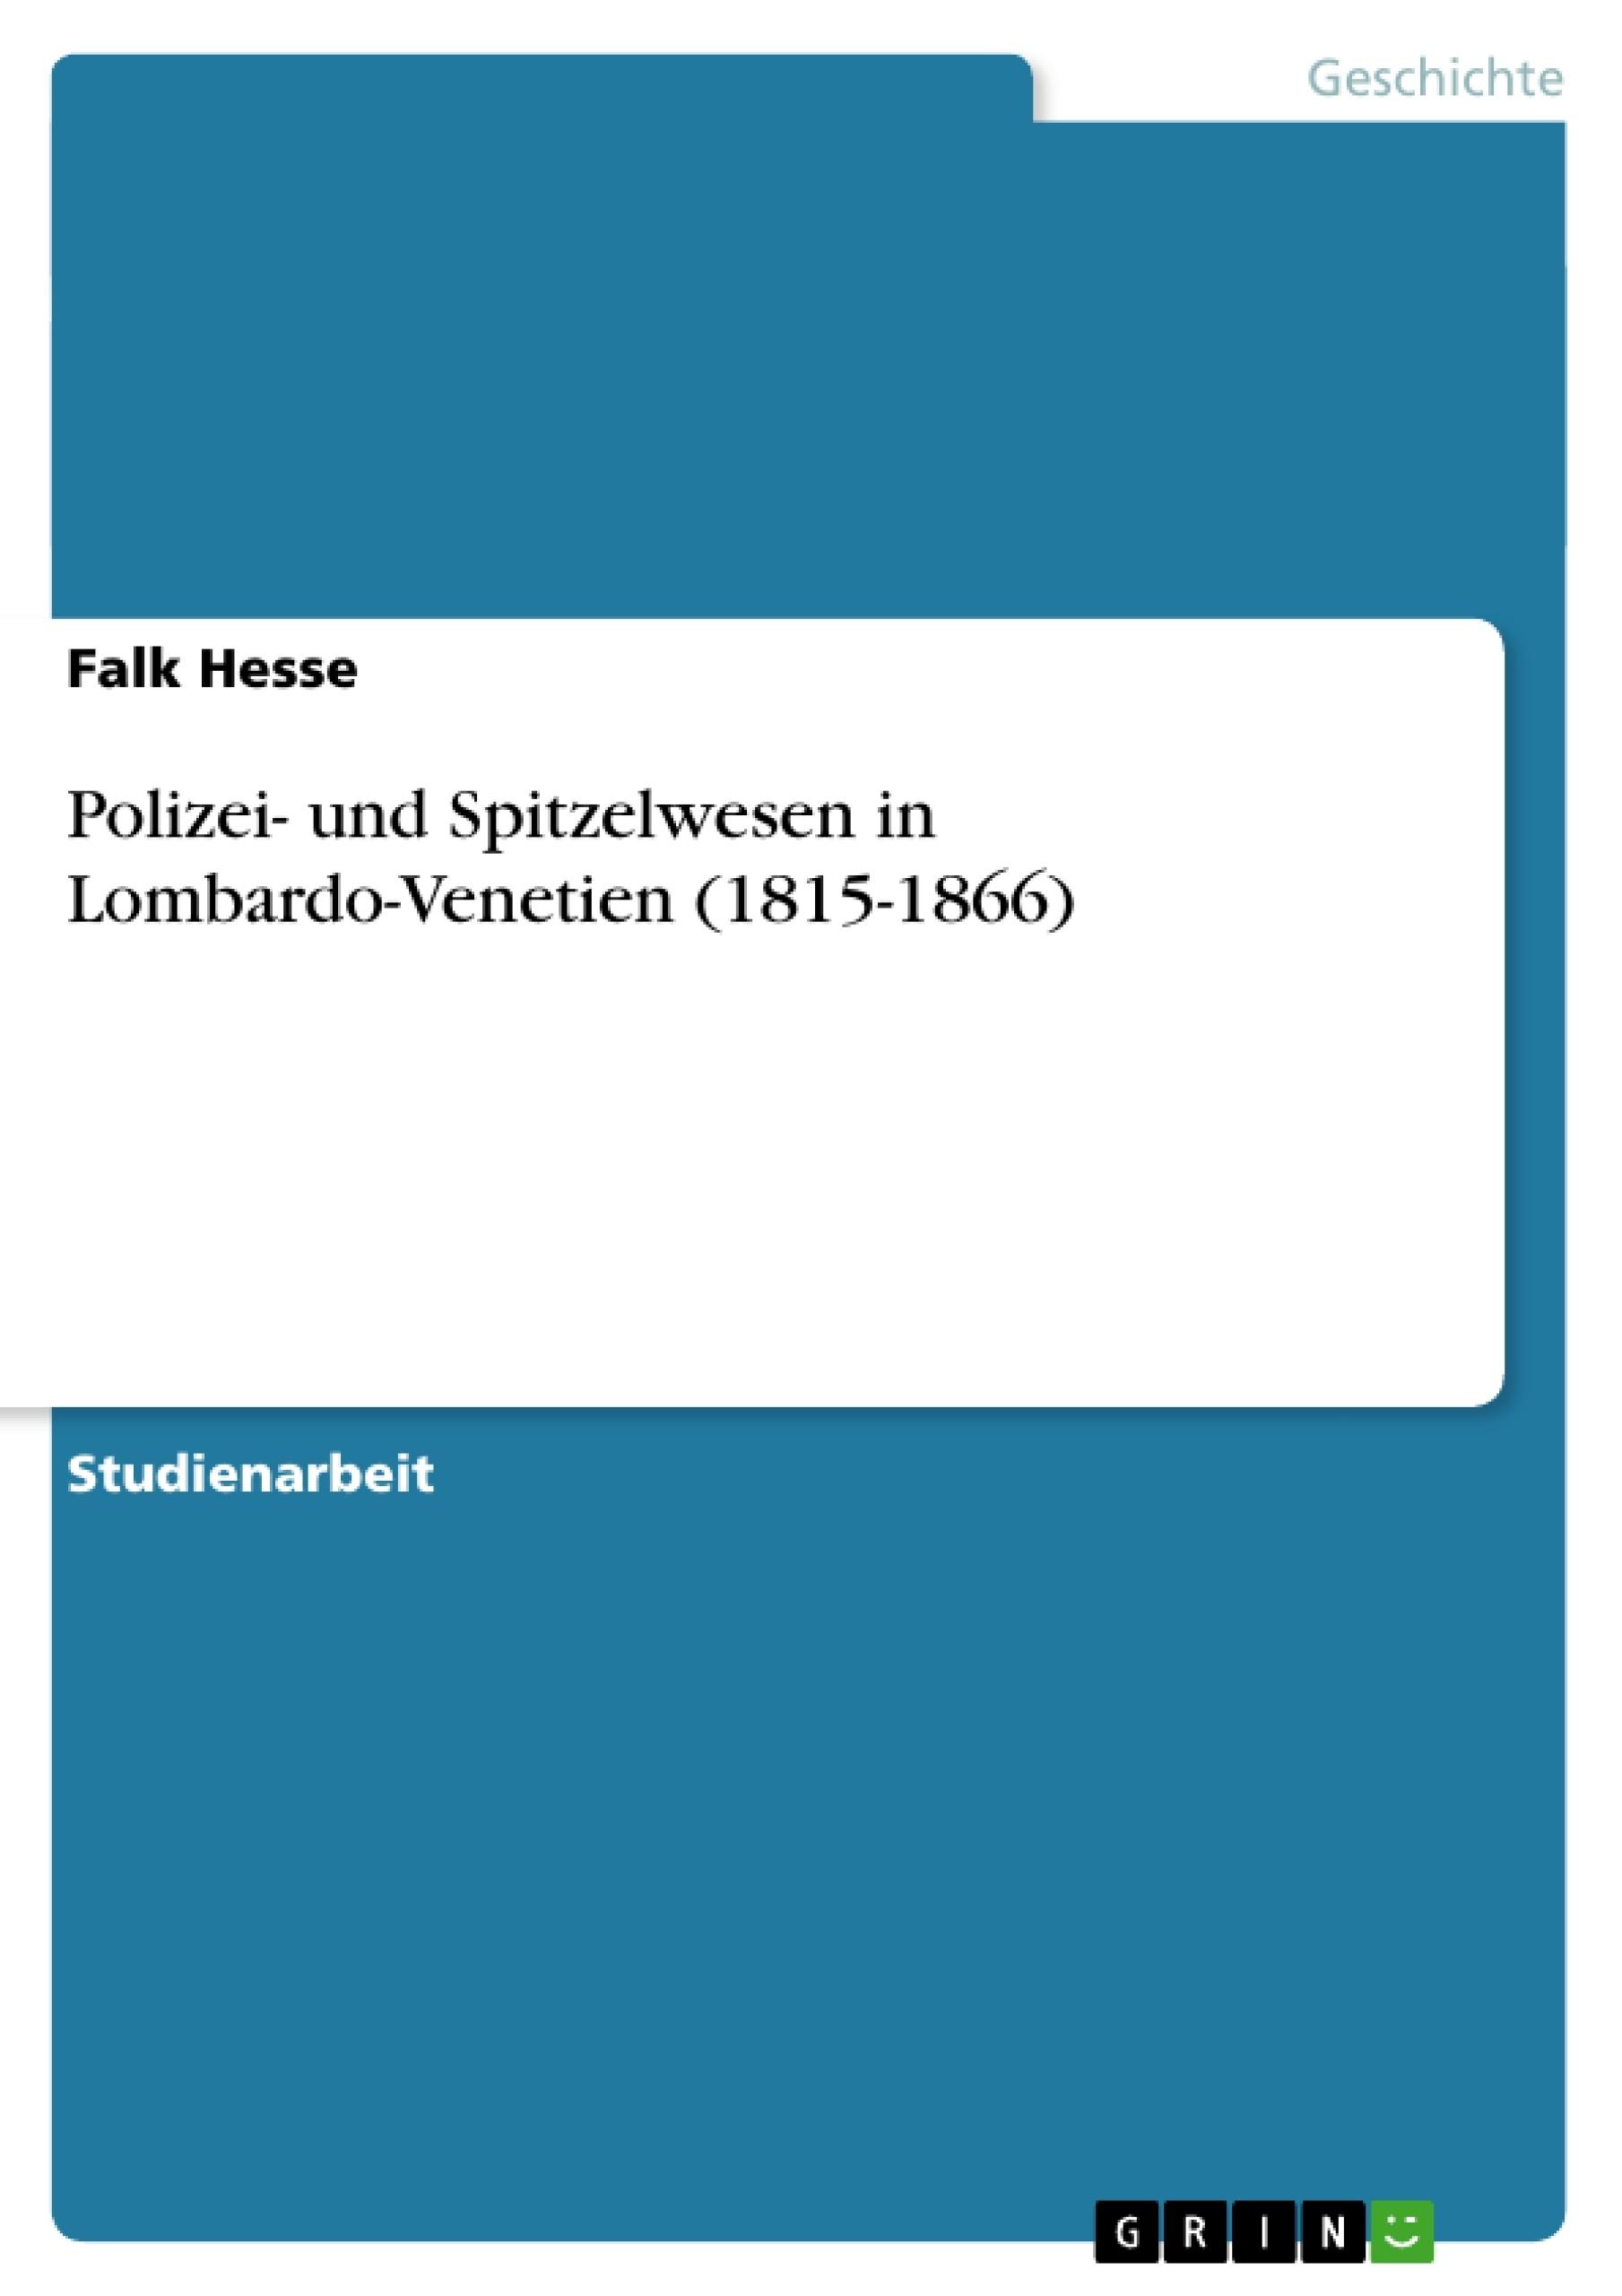 Titel: Polizei- und Spitzelwesen in Lombardo-Venetien (1815-1866)